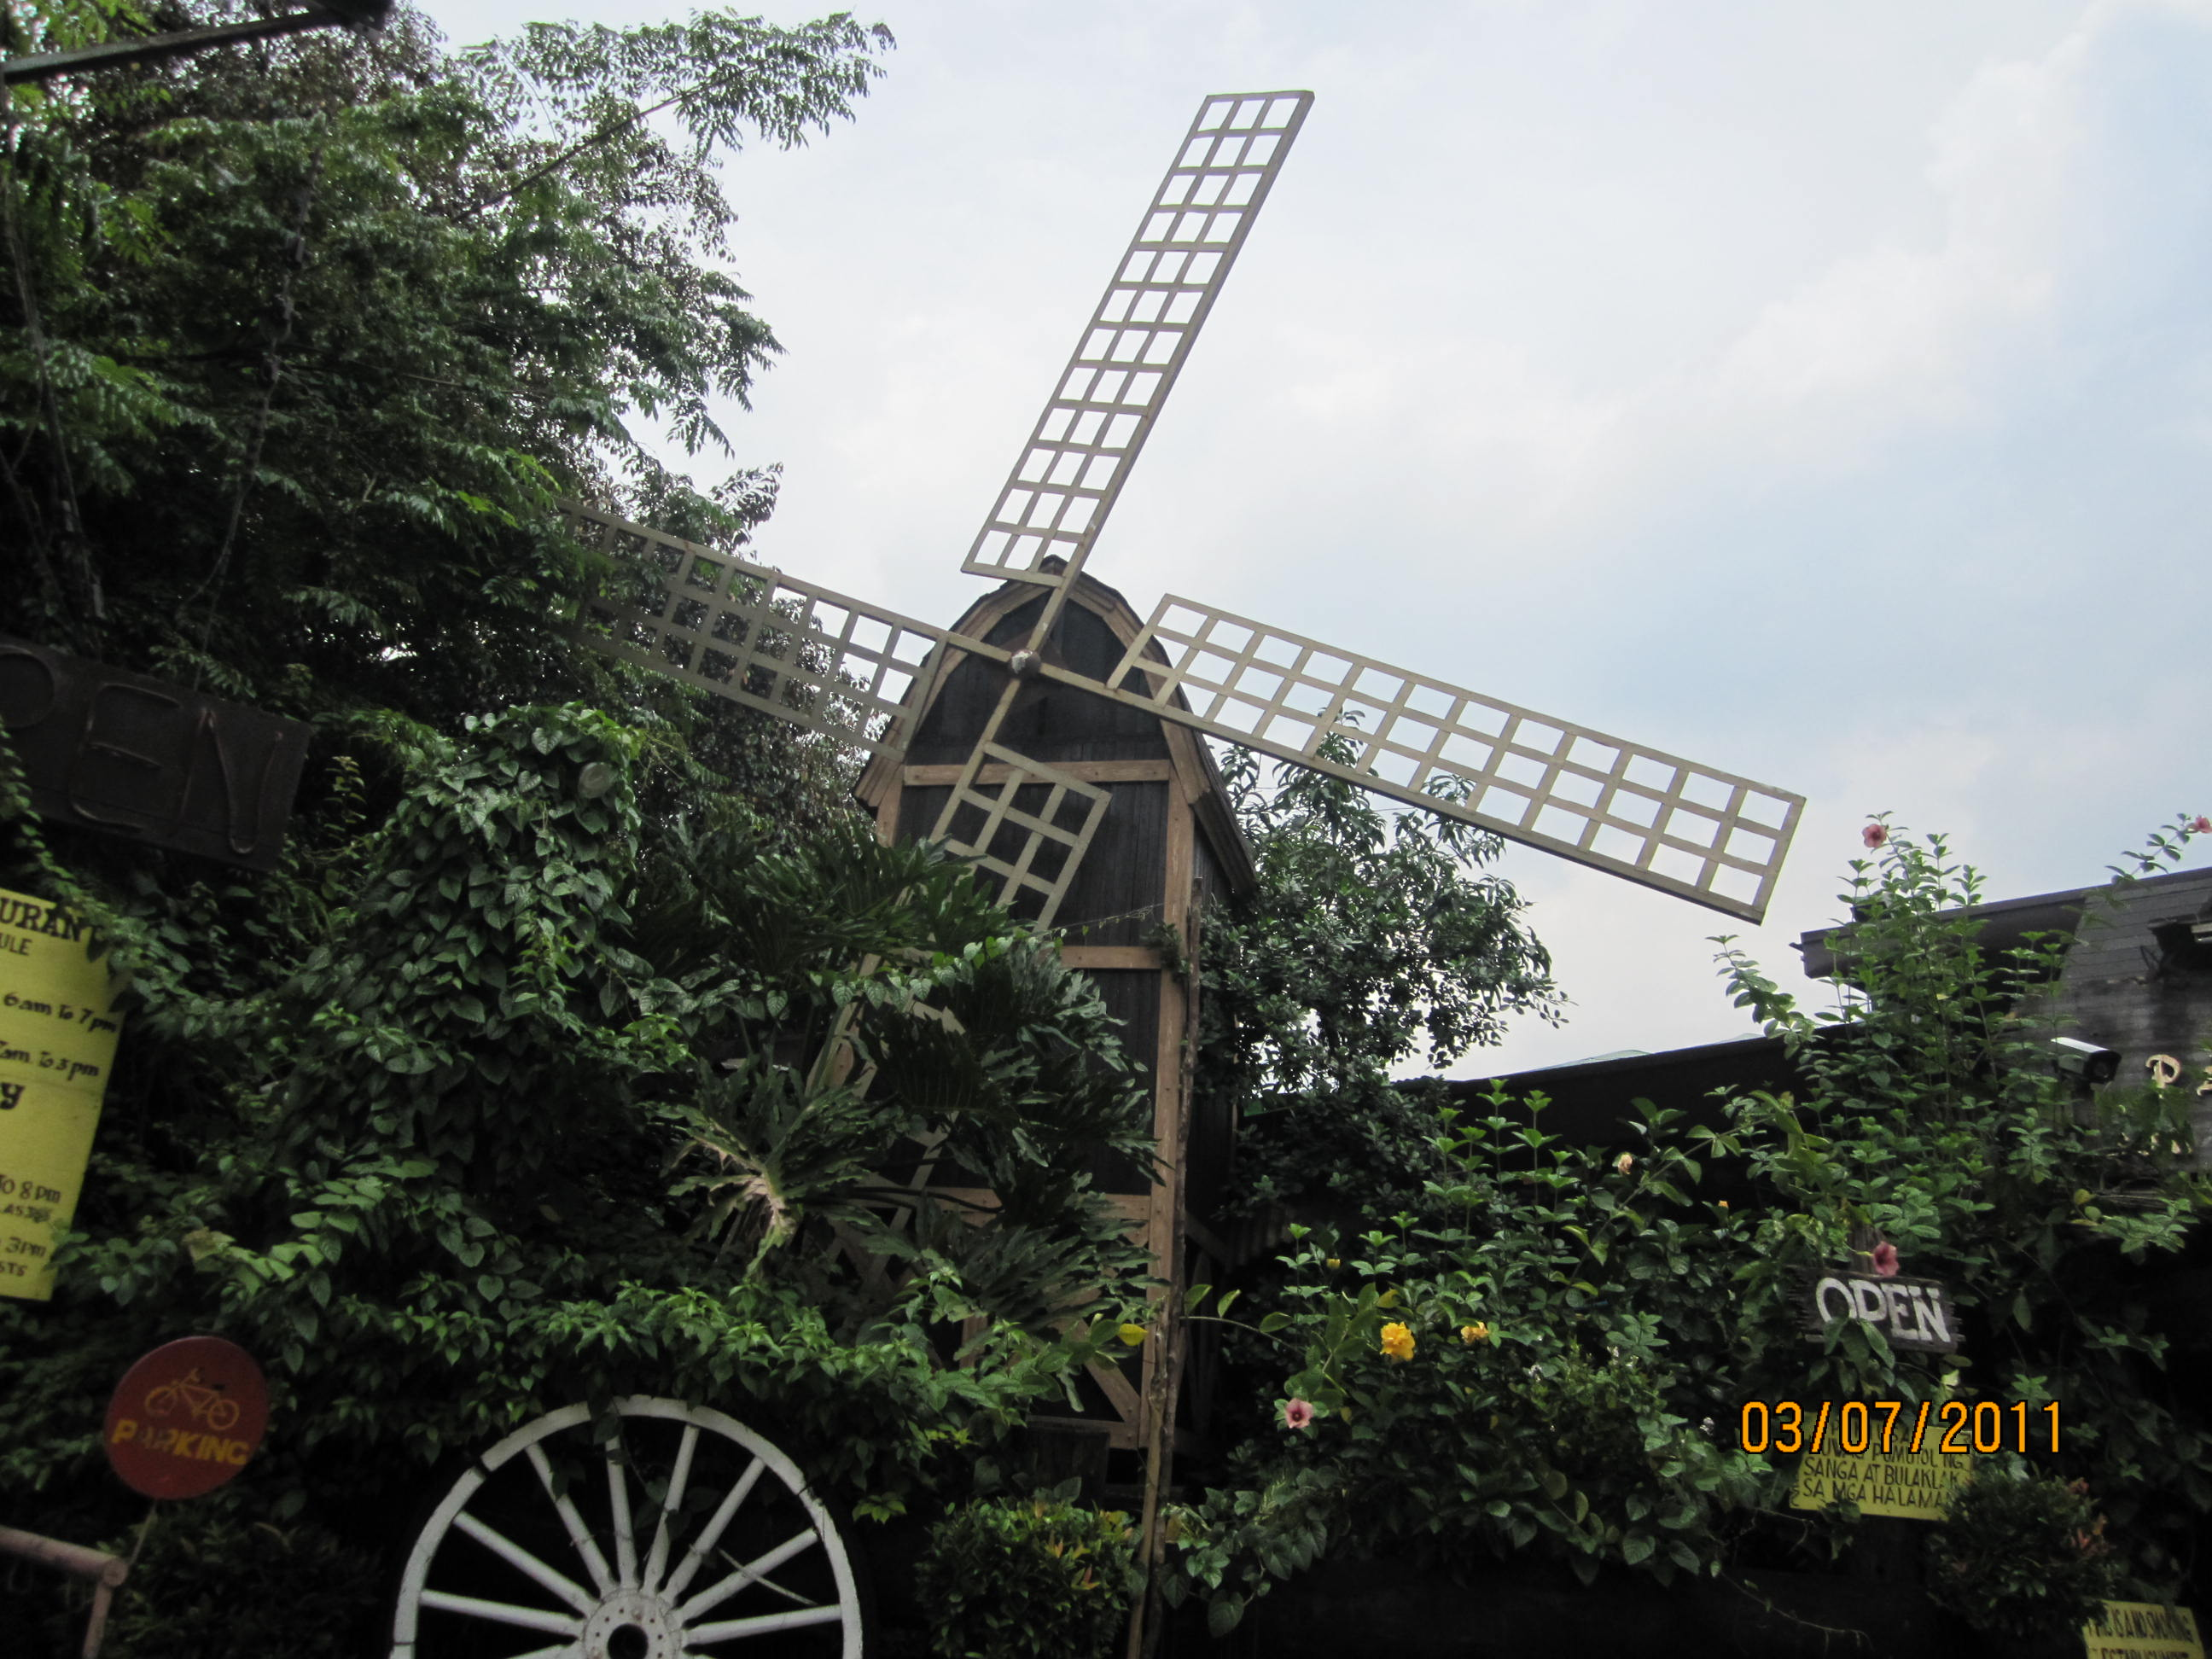 The facade of pan de amerikana with its signature windmill